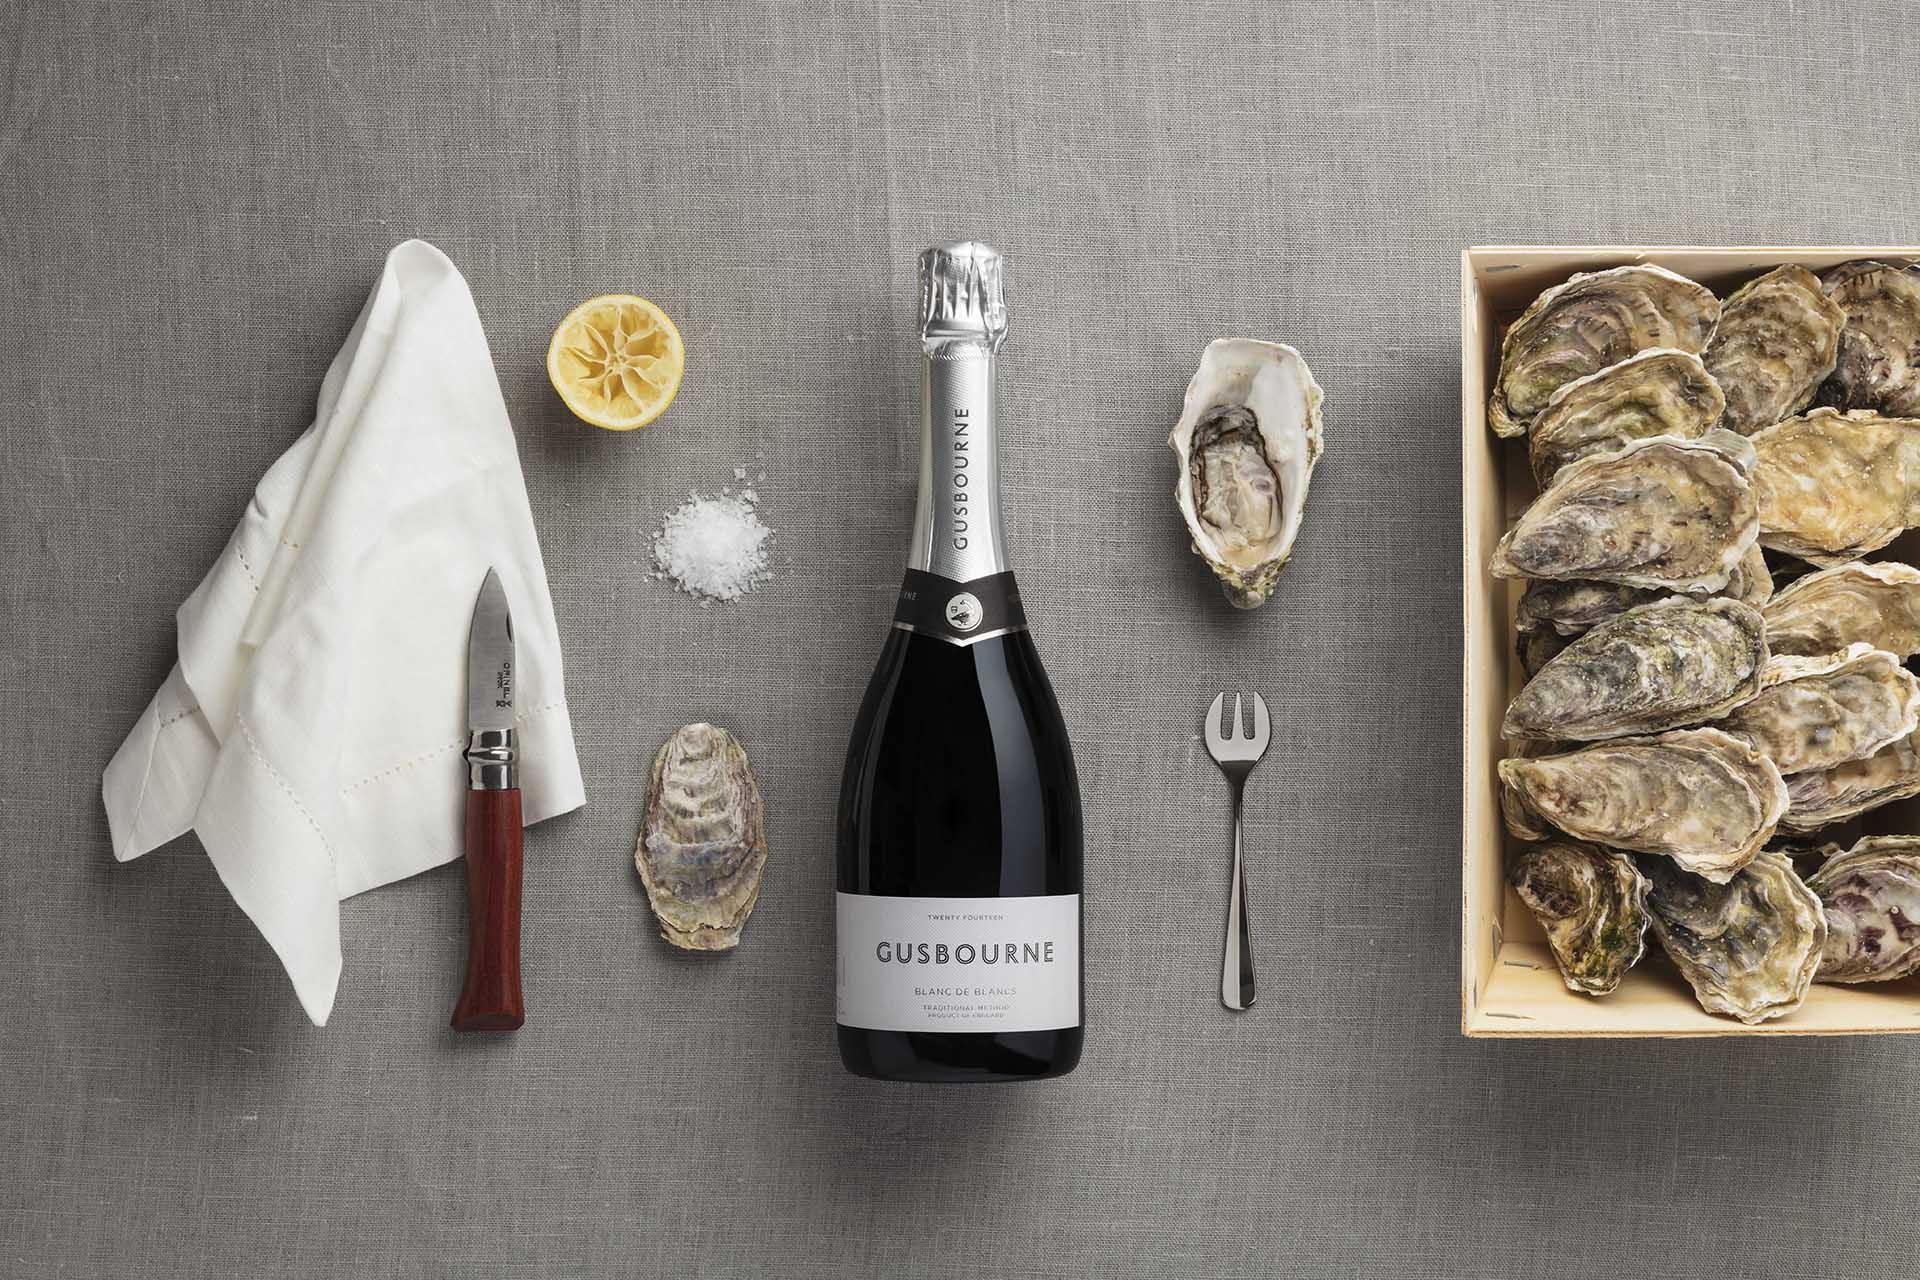 Gusbourne Blanc de blancs and oyster kit